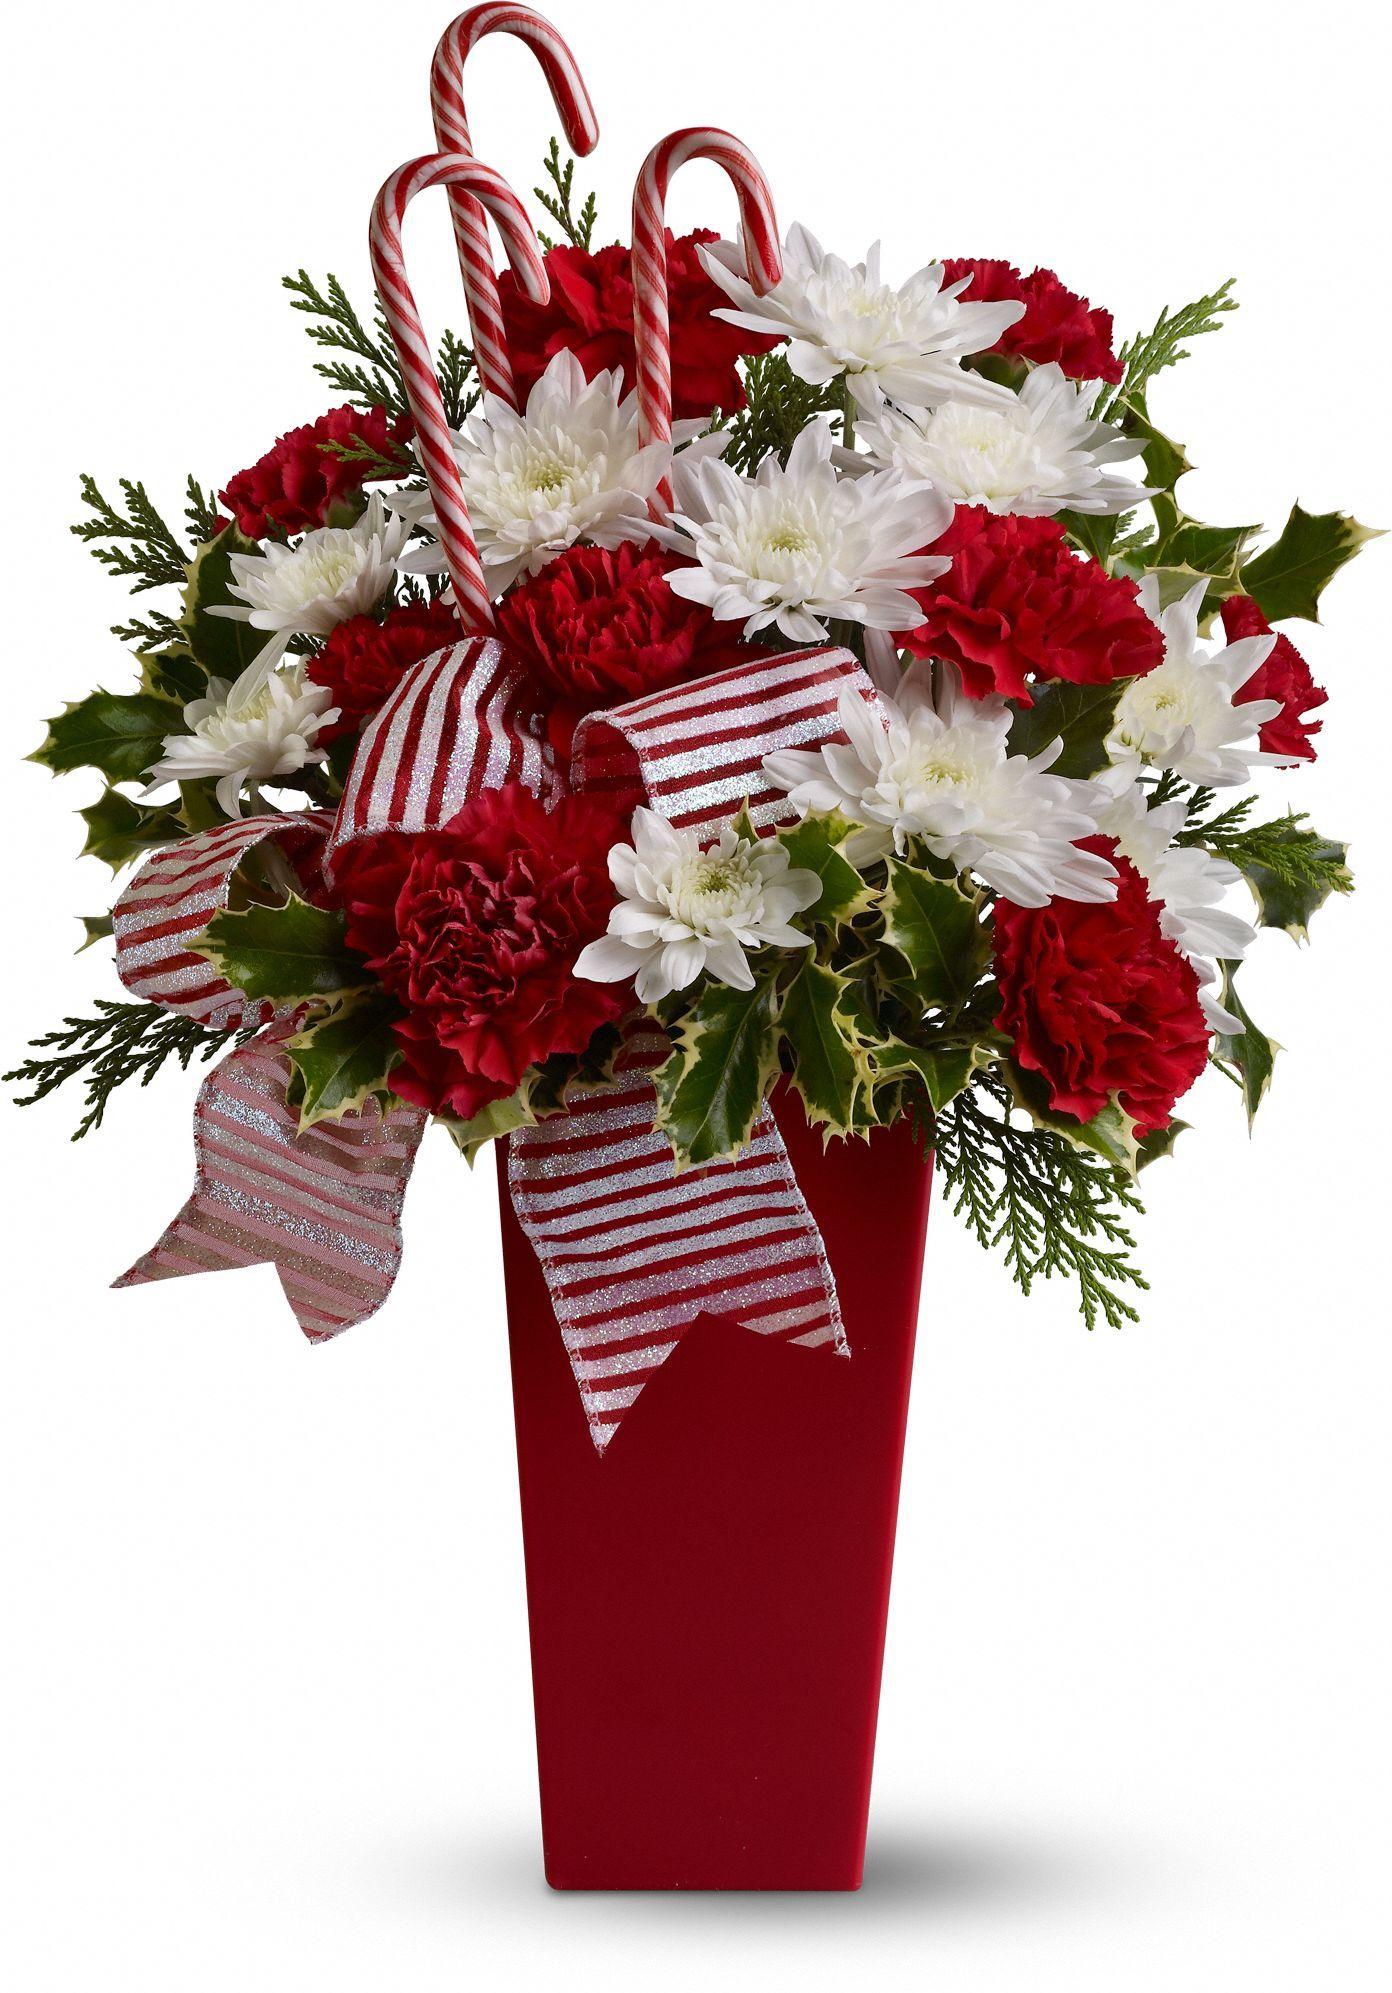 Peppermint Posies Christmas flower arrangements